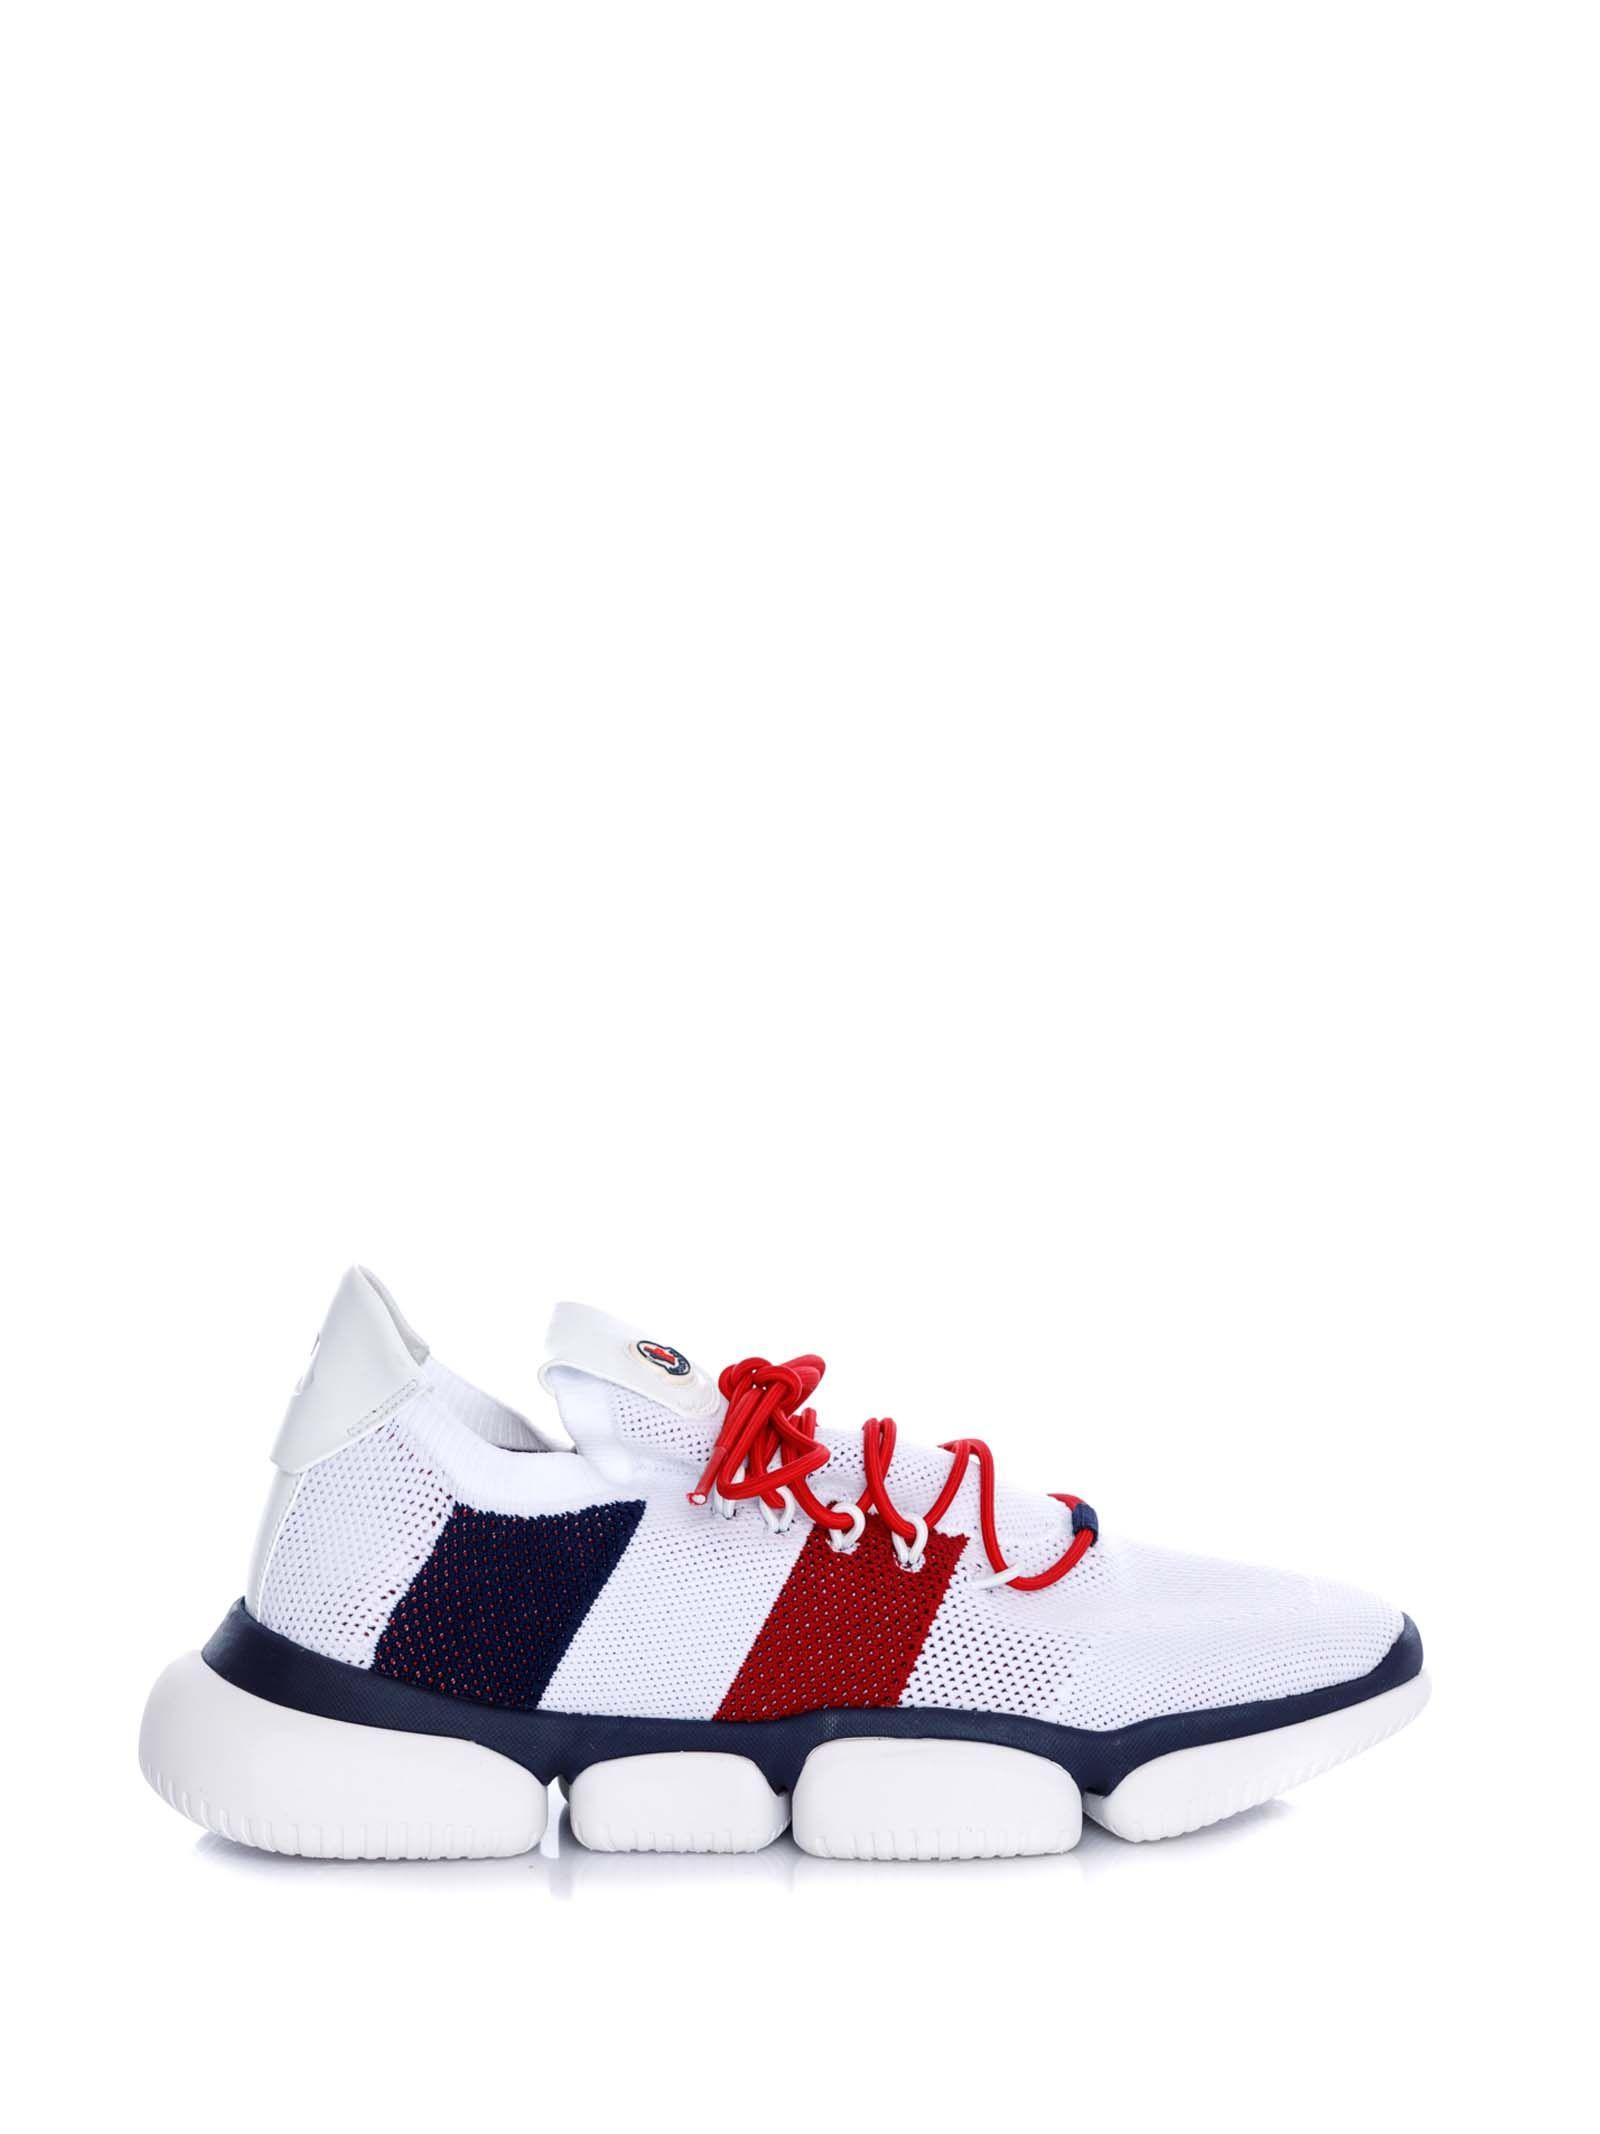 db8d9bf6501 MONCLER BUBBLE SOLE SNEAKERS. #moncler #shoes | Moncler in 2019 ...